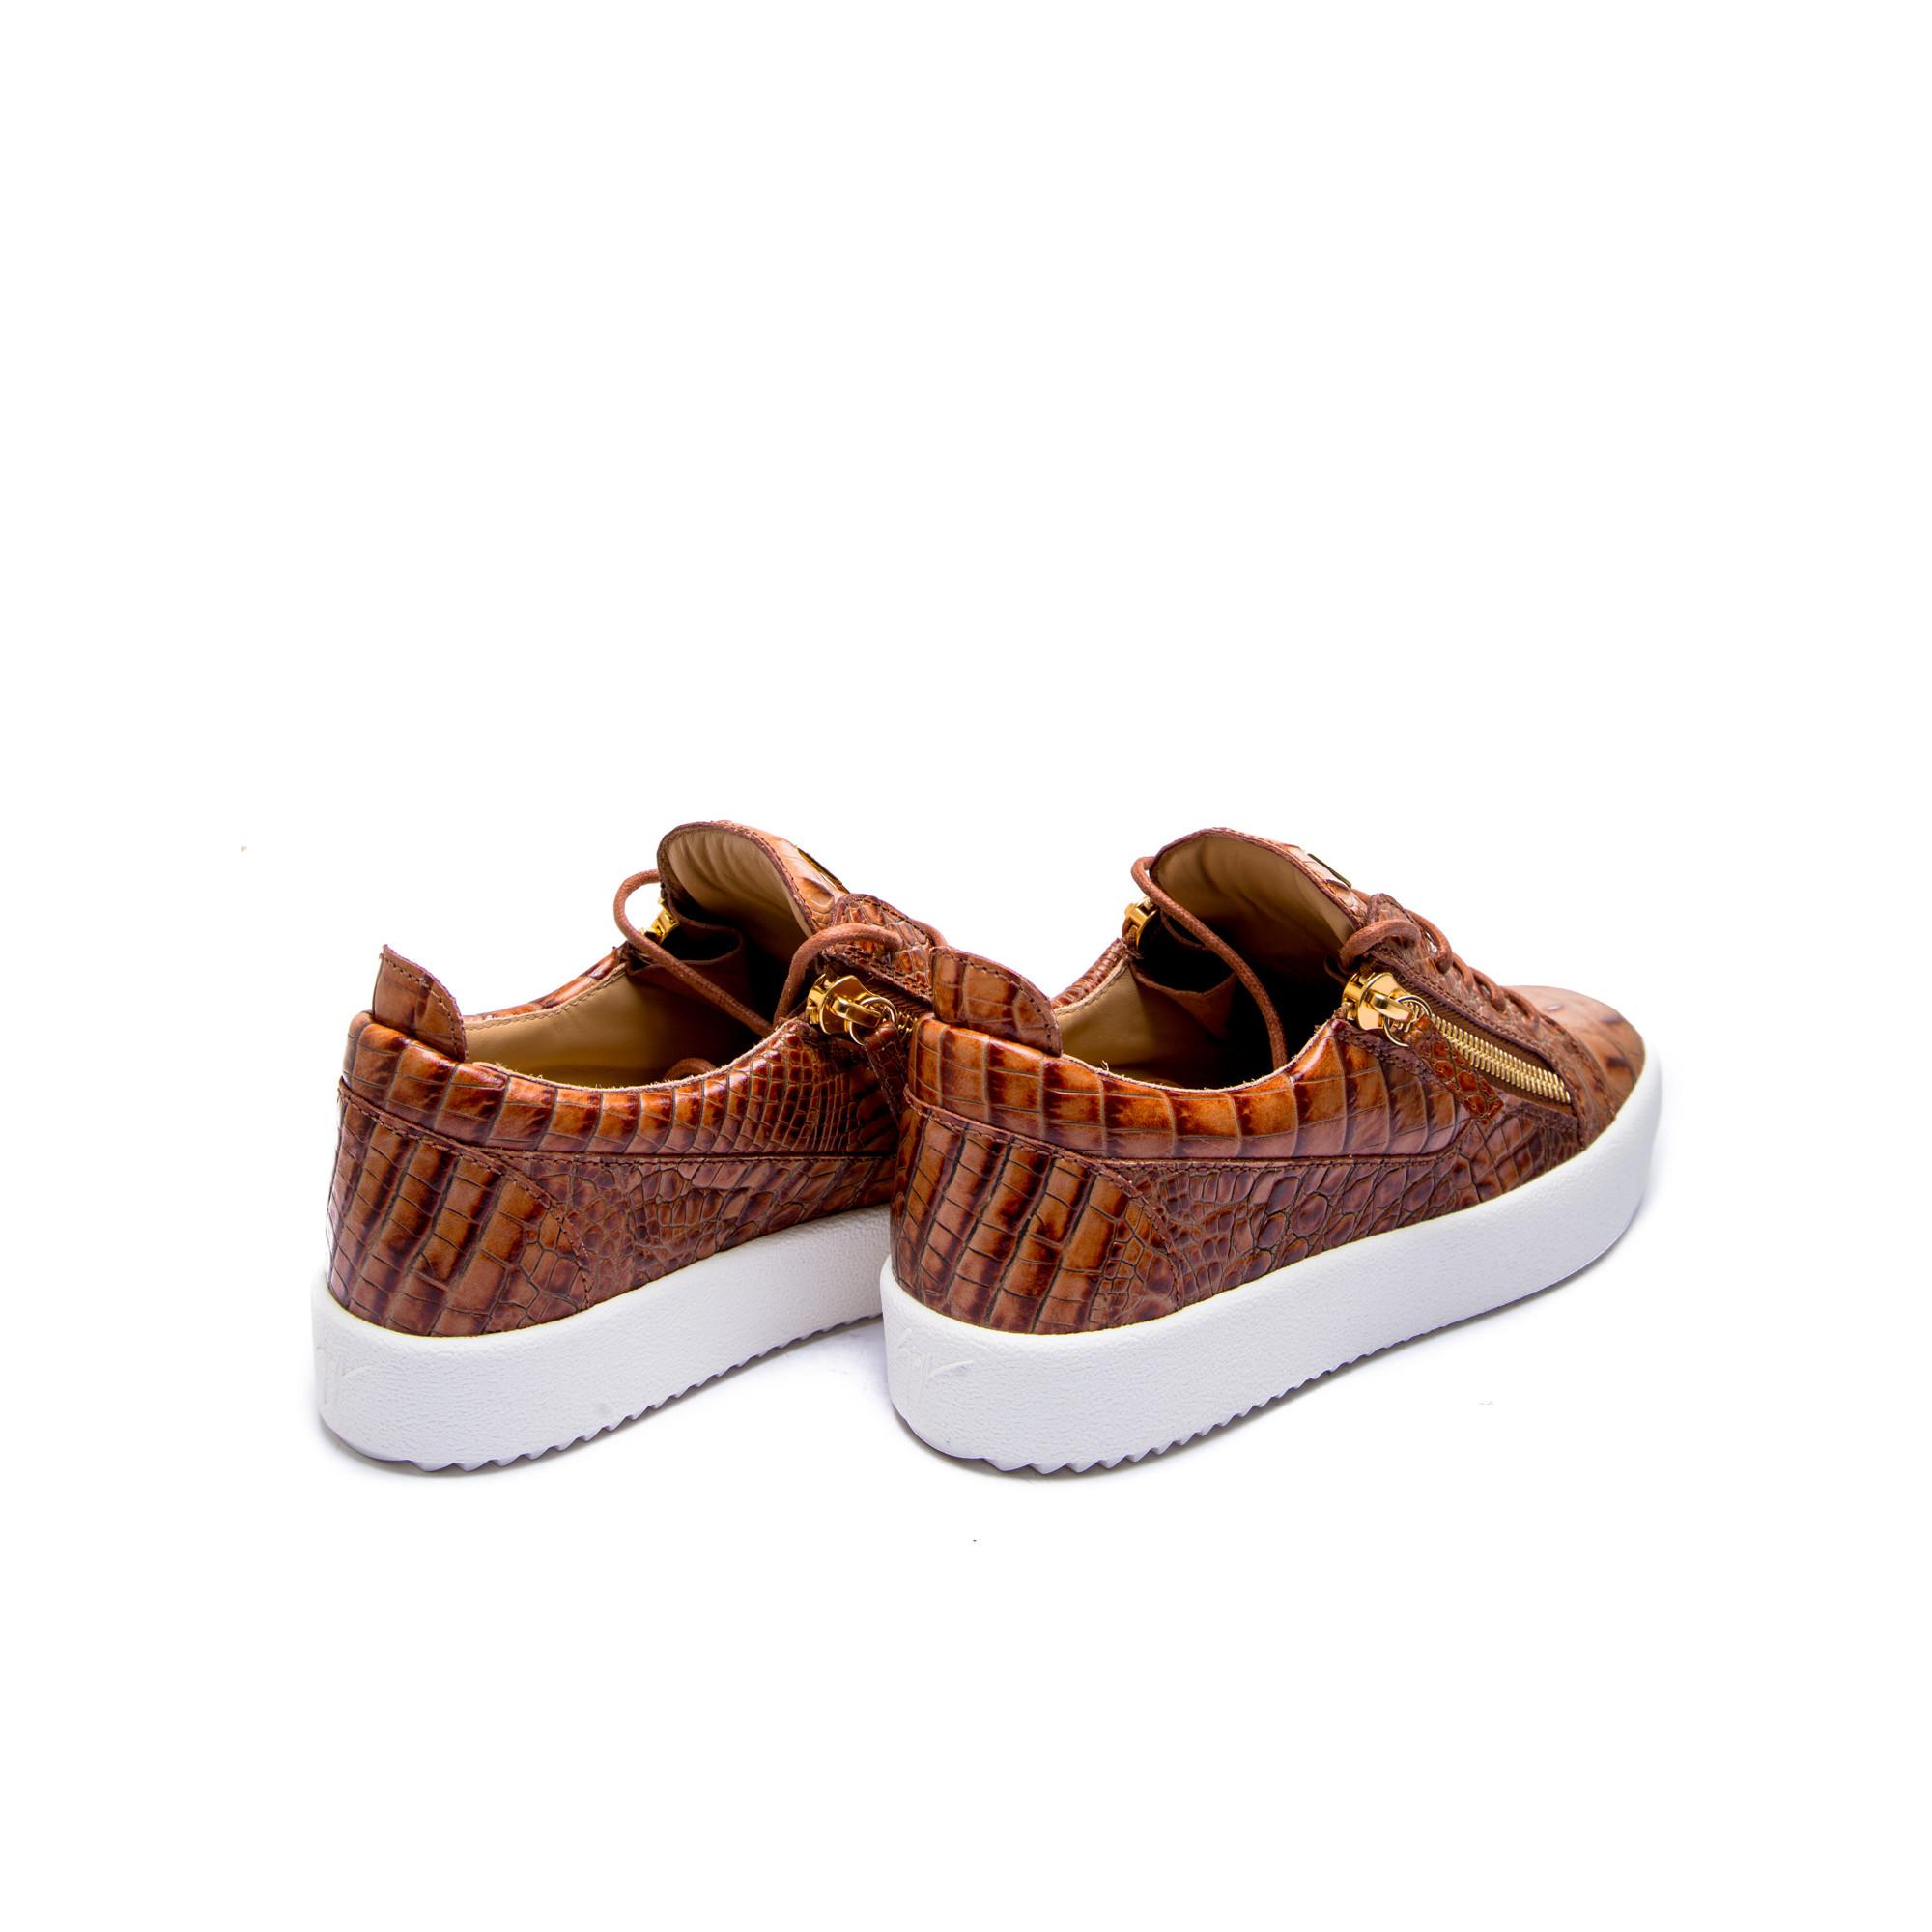 1c907343d5b80 ... Giuseppe Zanotti sneaker schafla brown Giuseppe Zanotti sneaker schafla  brown - www.derodeloper.com ...